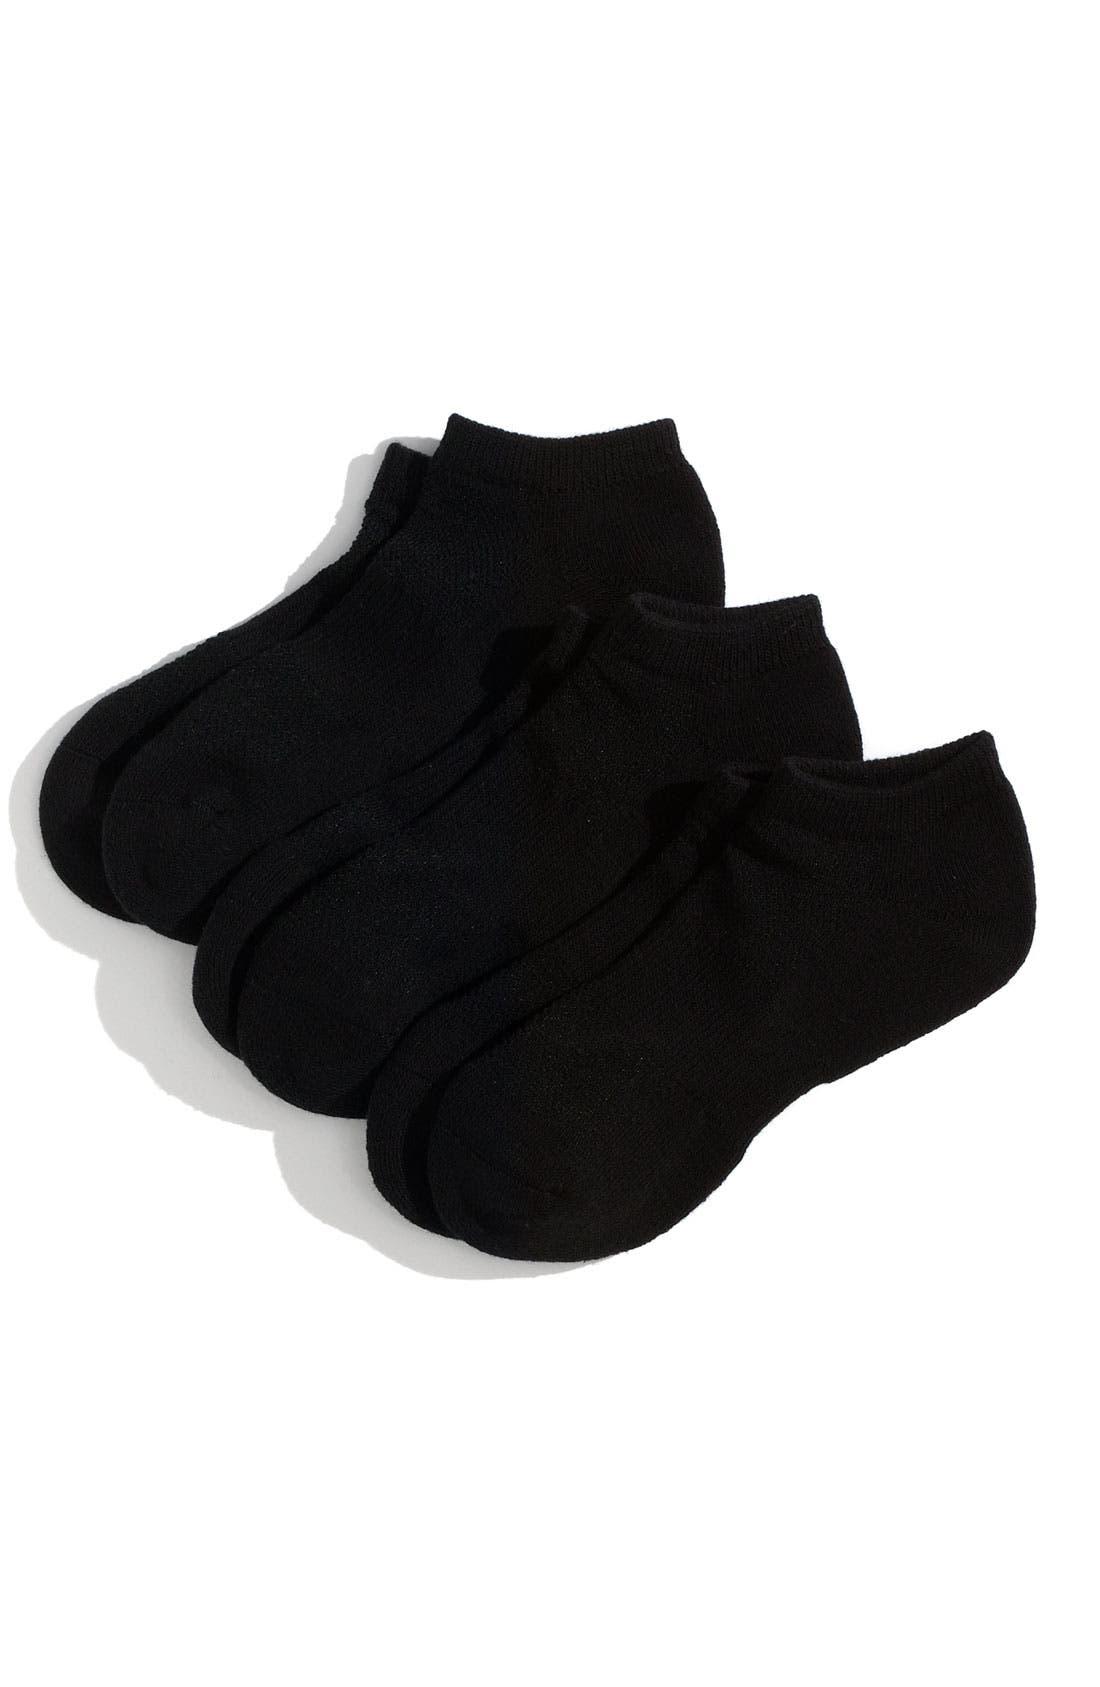 Alternate Image 1 Selected - Nordstrom Low Cut Active Socks (3-Pack)(Toddler, Little Boys & Big Boys)